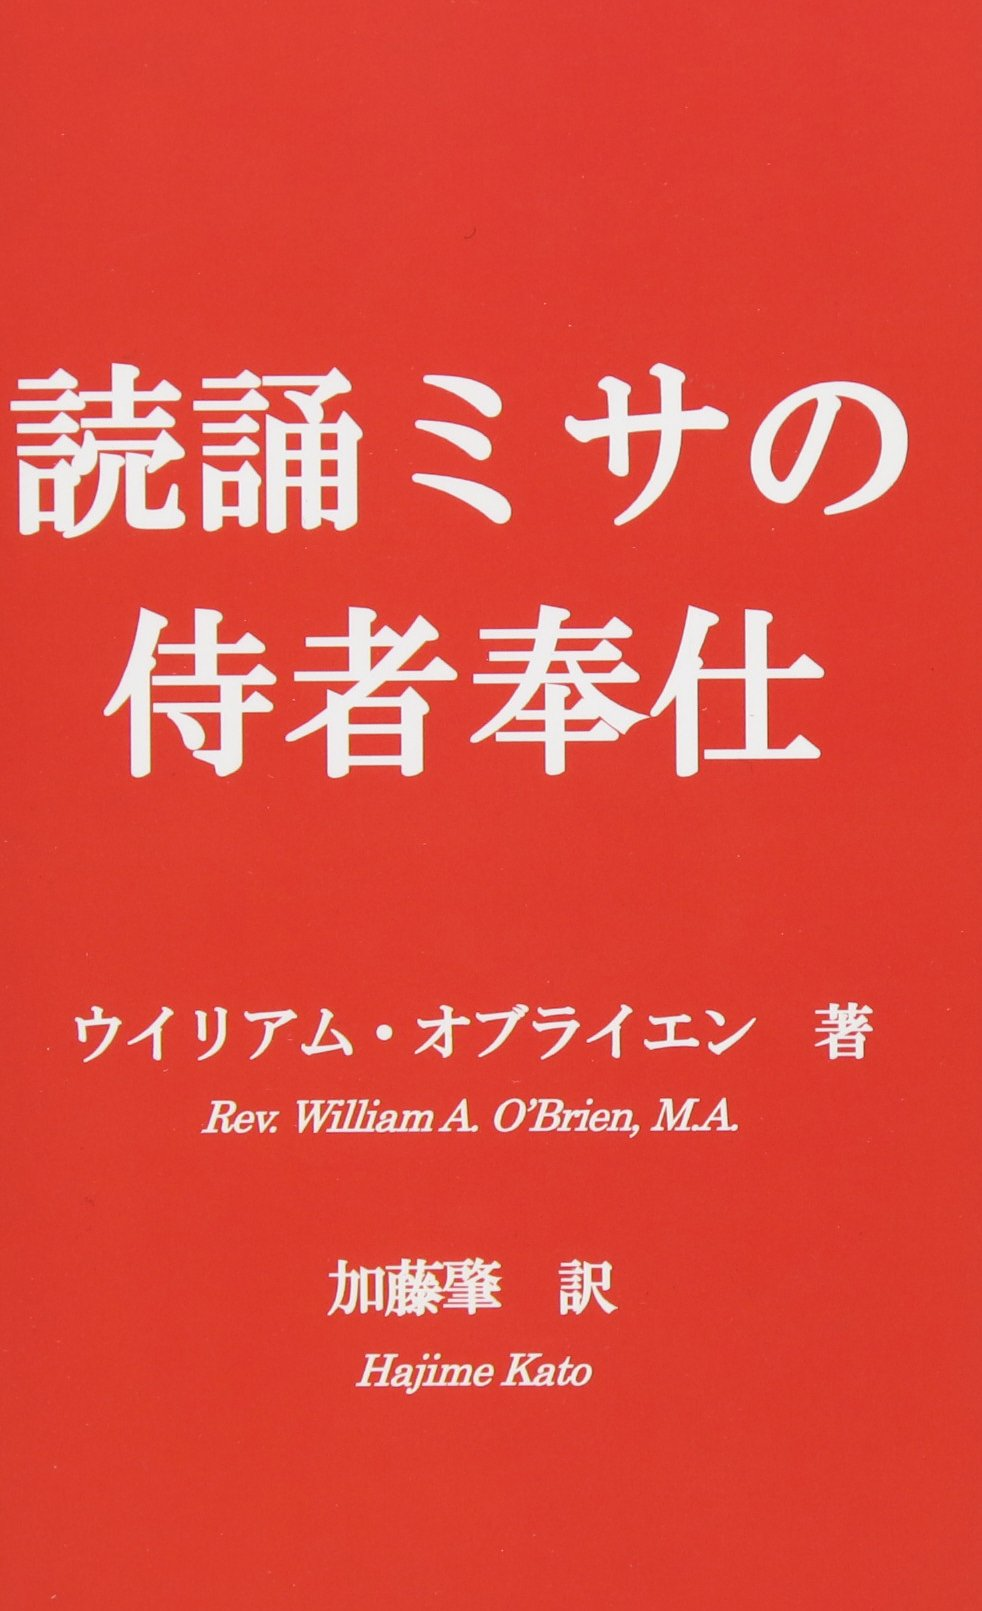 Download Dokusyomisa no Jisya Hoshi: How to Serve Low Mass and Benediction (Japanese Edition) pdf epub